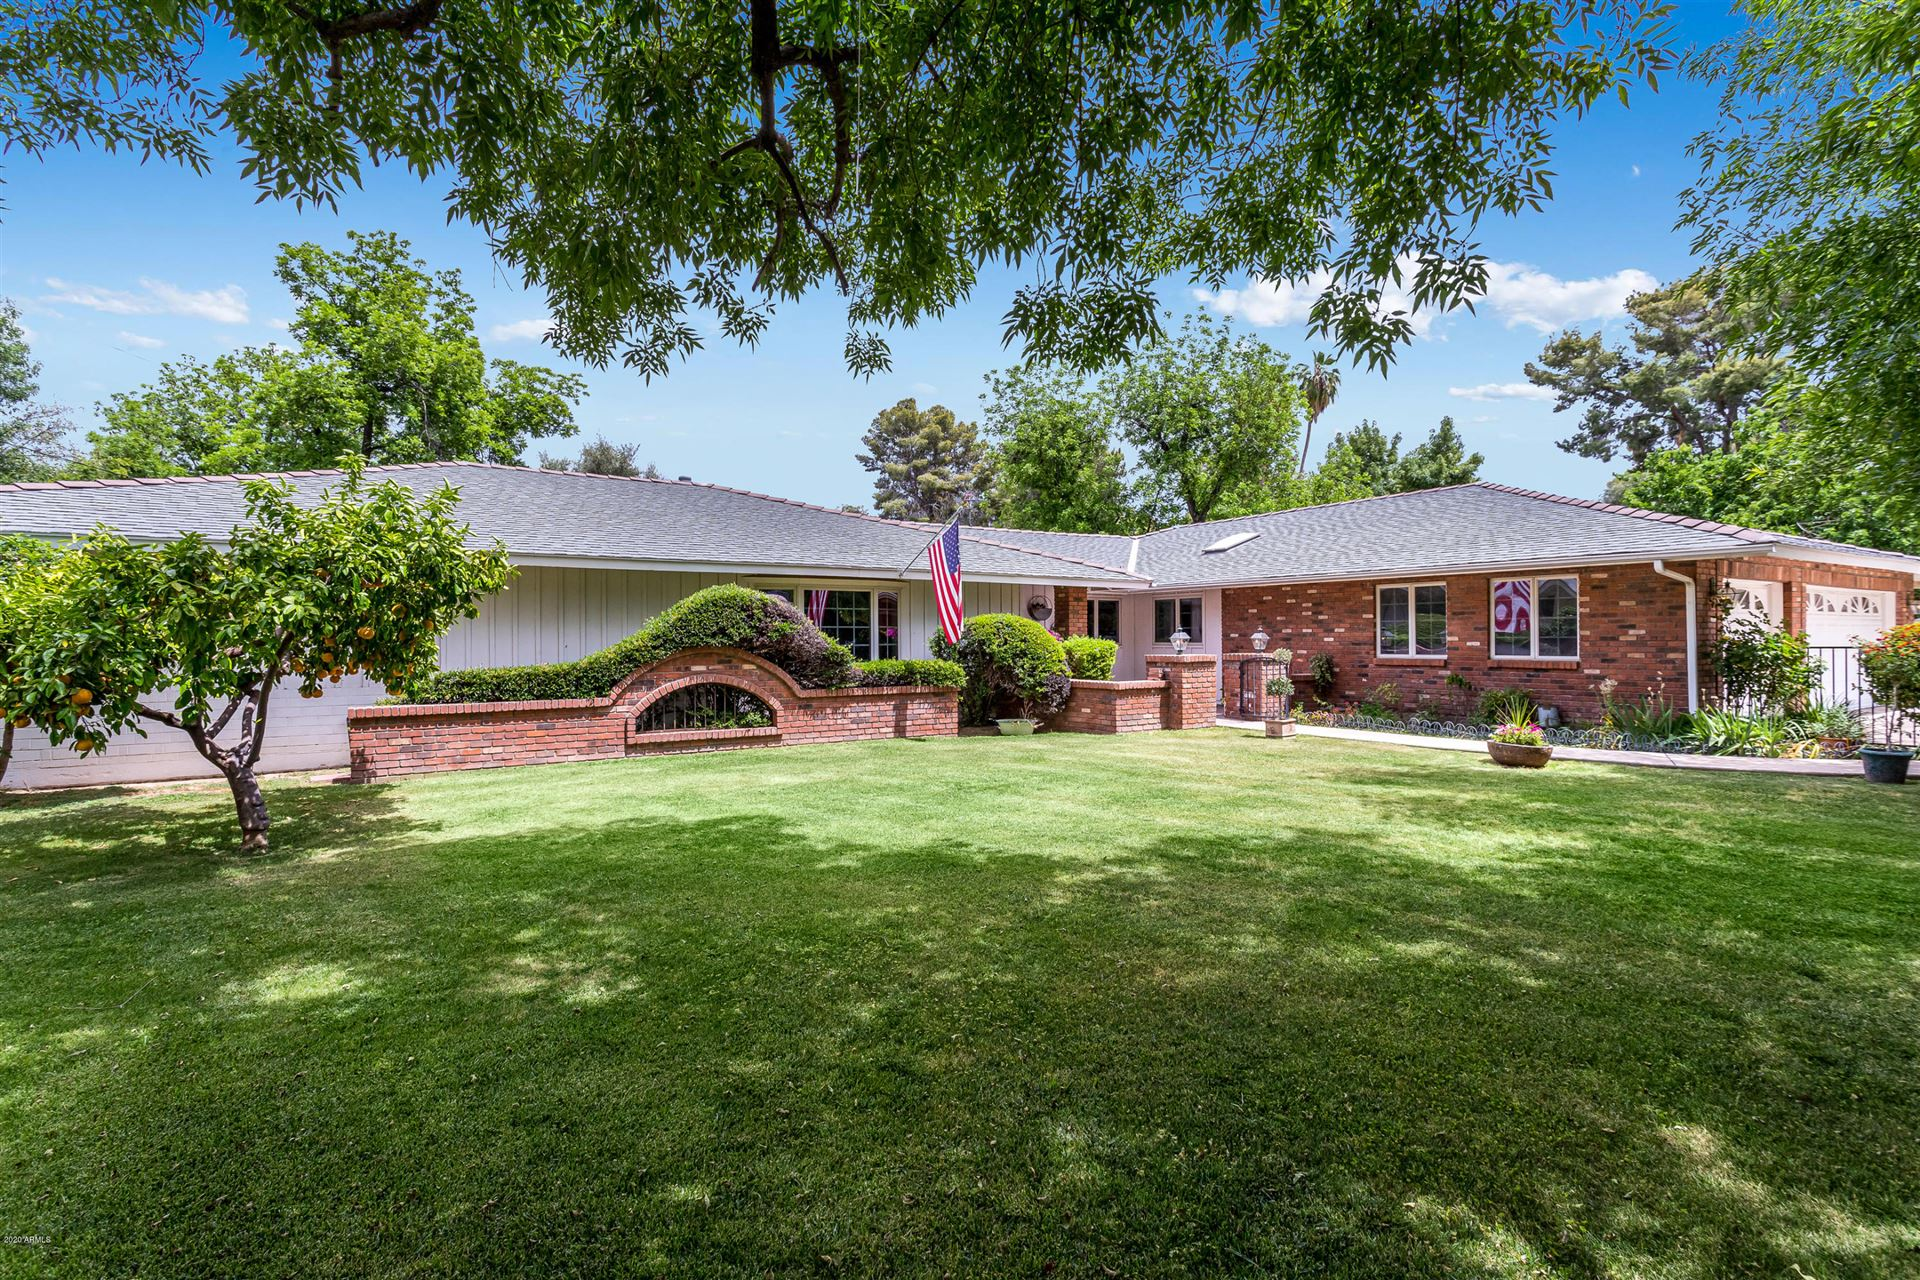 Property Image Of 8051 N 15Th Avenue In Phoenix, Az